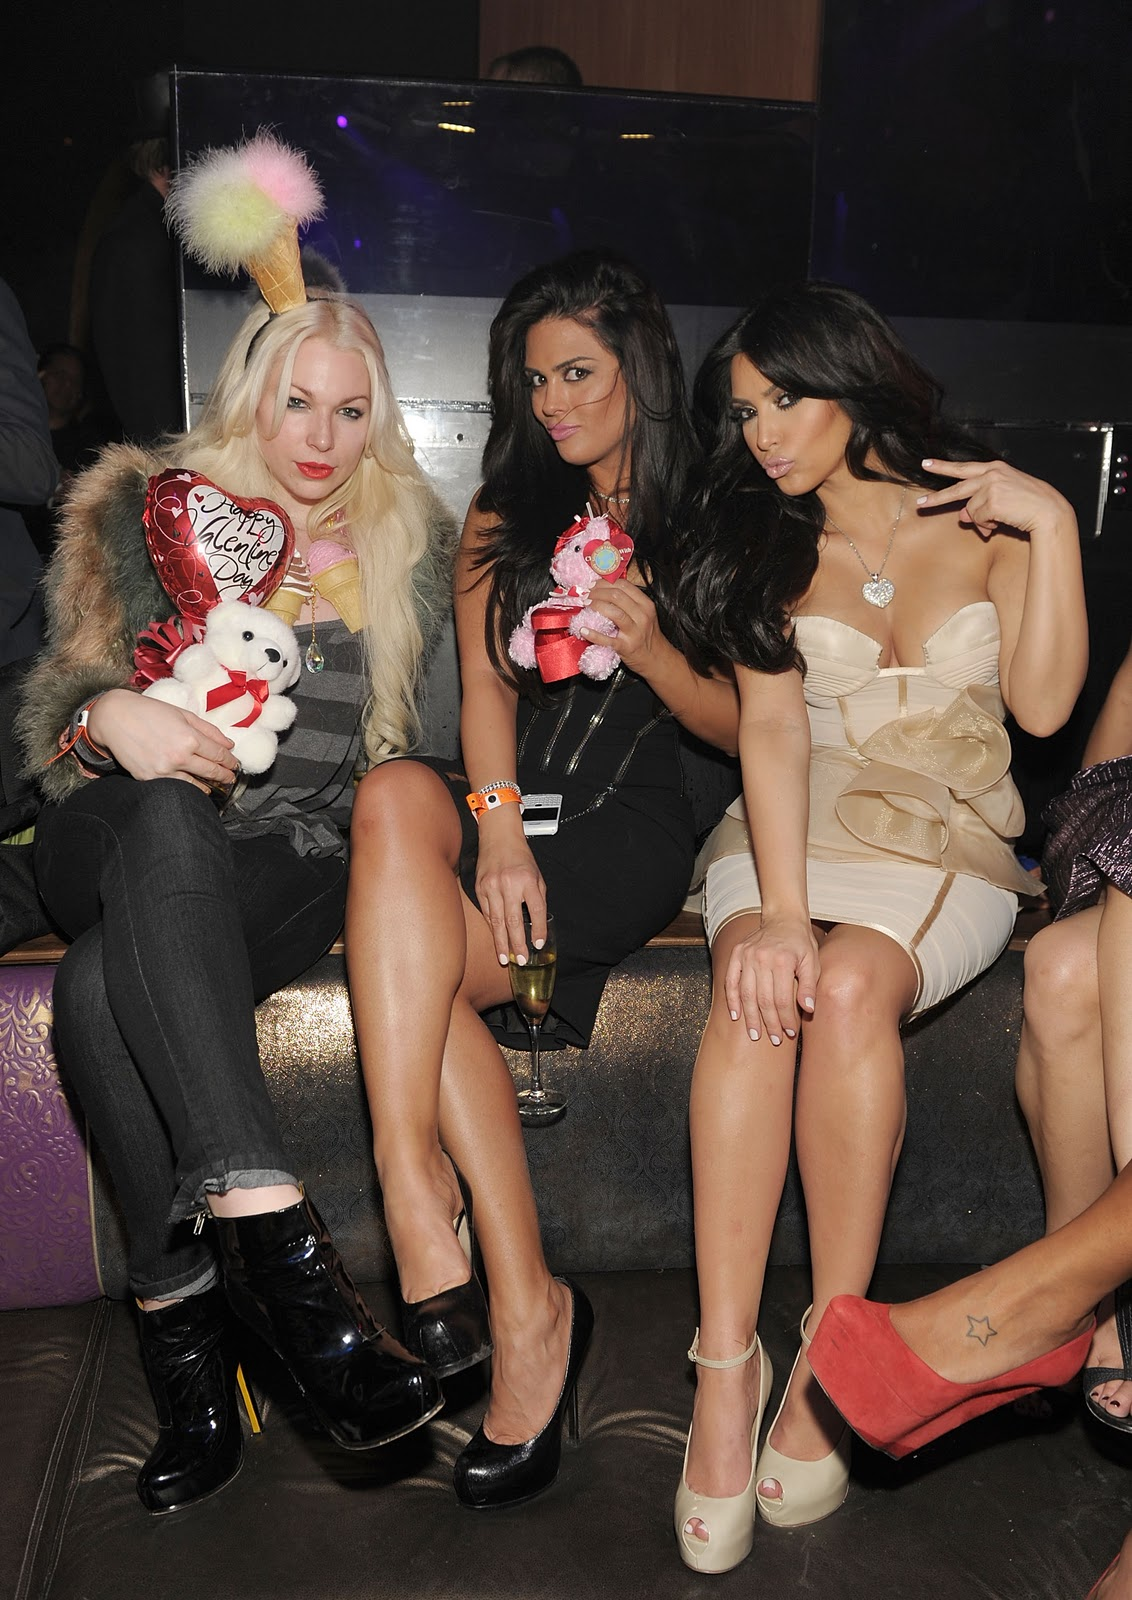 http://1.bp.blogspot.com/-R__RkR85bXs/TVrbz2-kECI/AAAAAAAAO4E/kzZcVakfh9k/s1600/Joyce+Bonelli%252C+Carla+DiBello+and+Kim+Kardashian+at+Marquee+LV%25282%2529.JPG